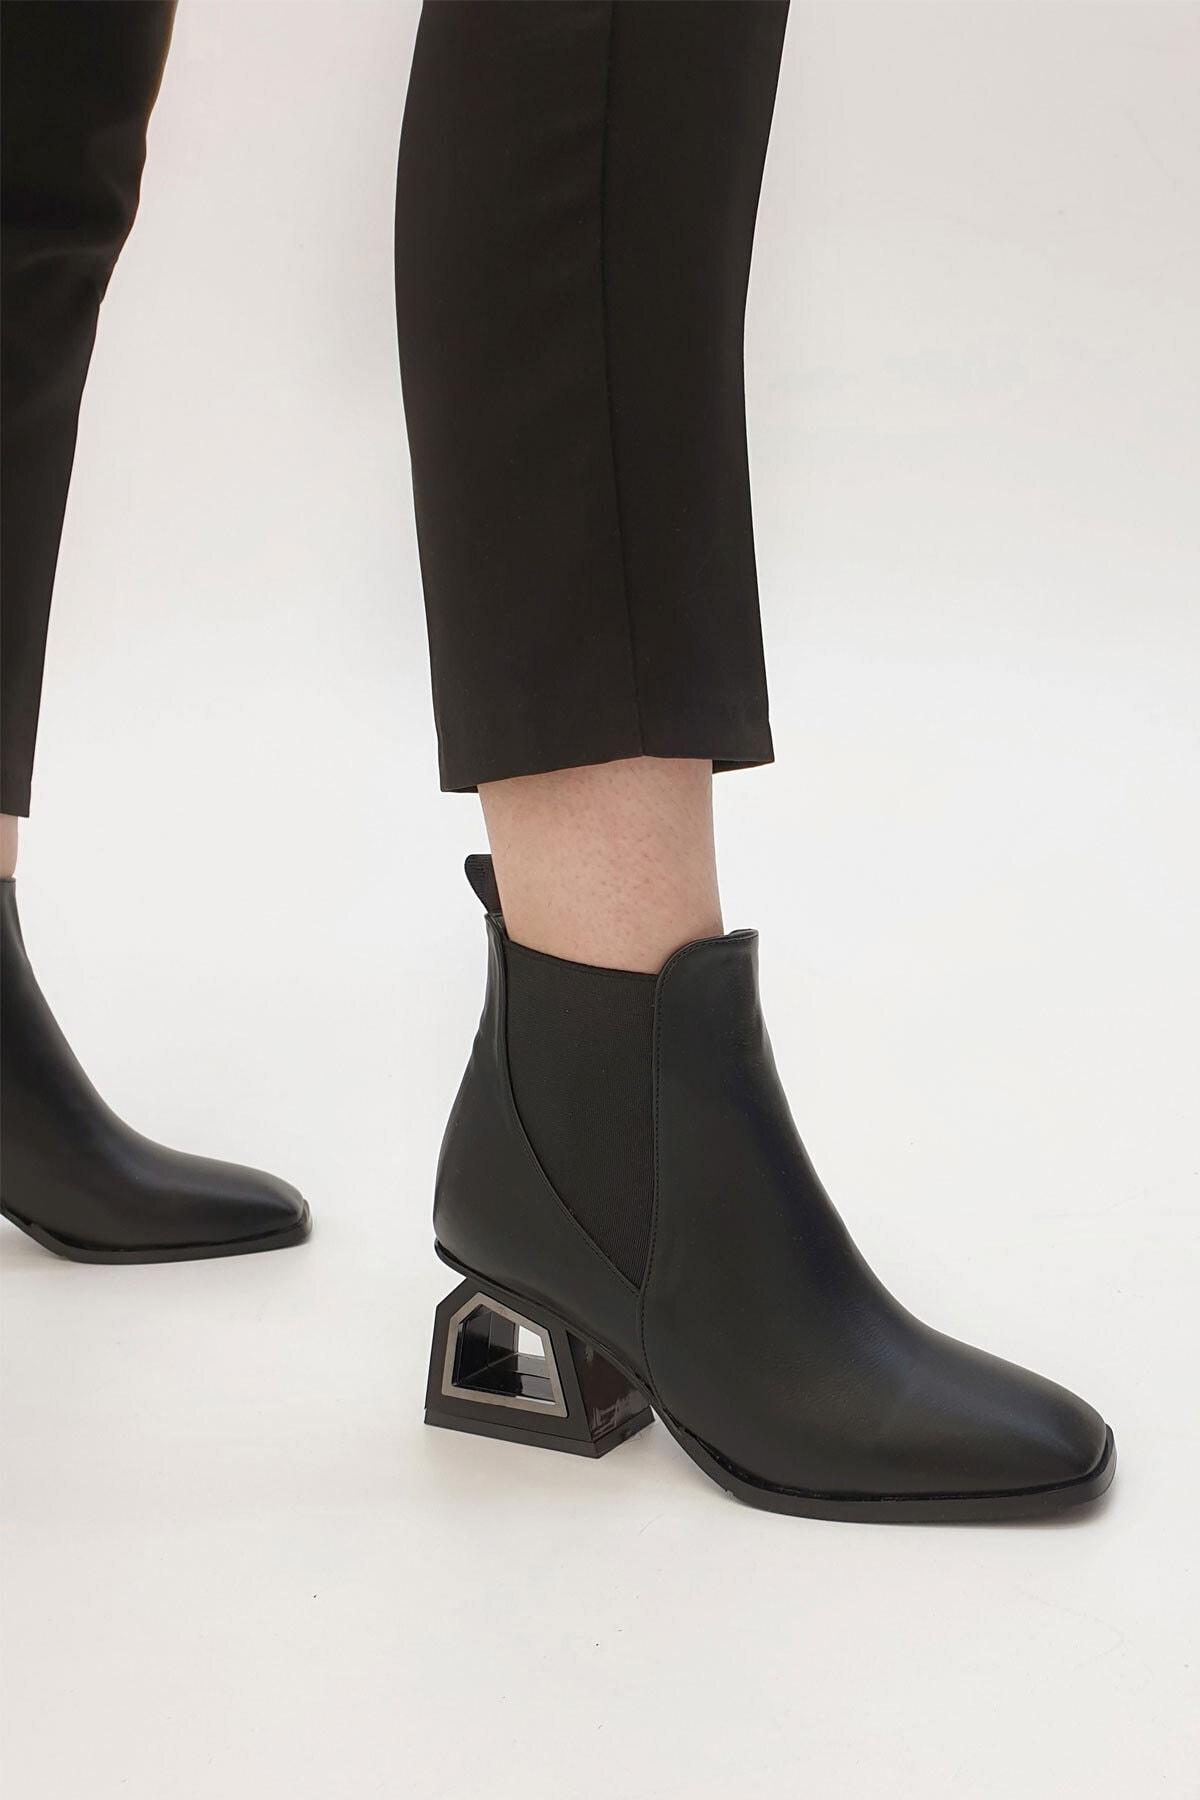 Marjin Kadın Siyah Ferlos Lastikli Topuklu Bot 2